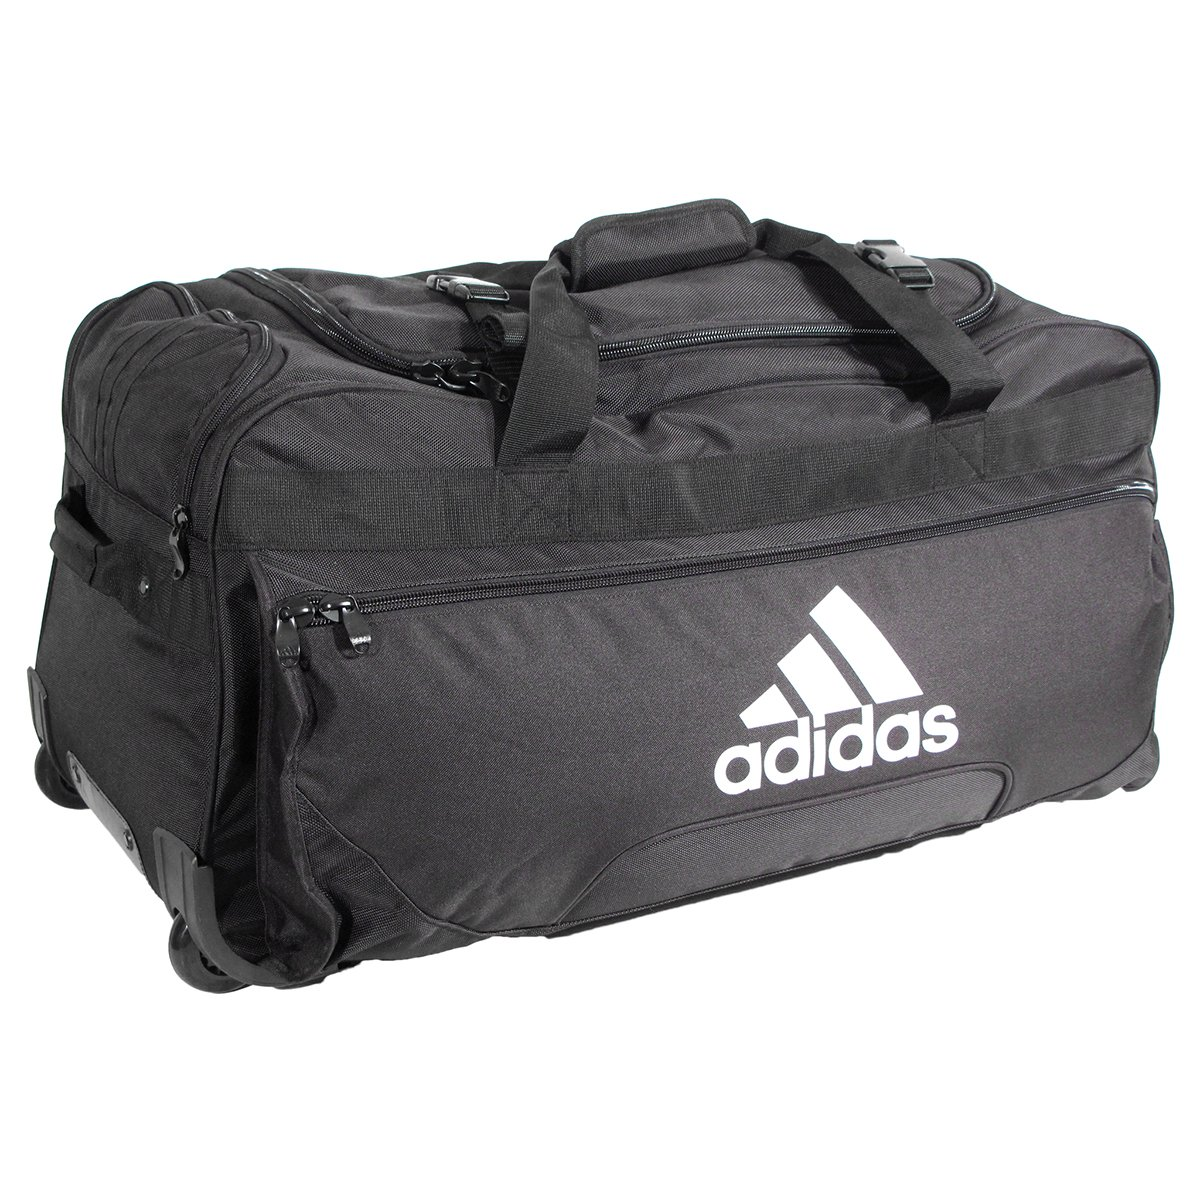 adidas Team Wheel Bag,Black,one size